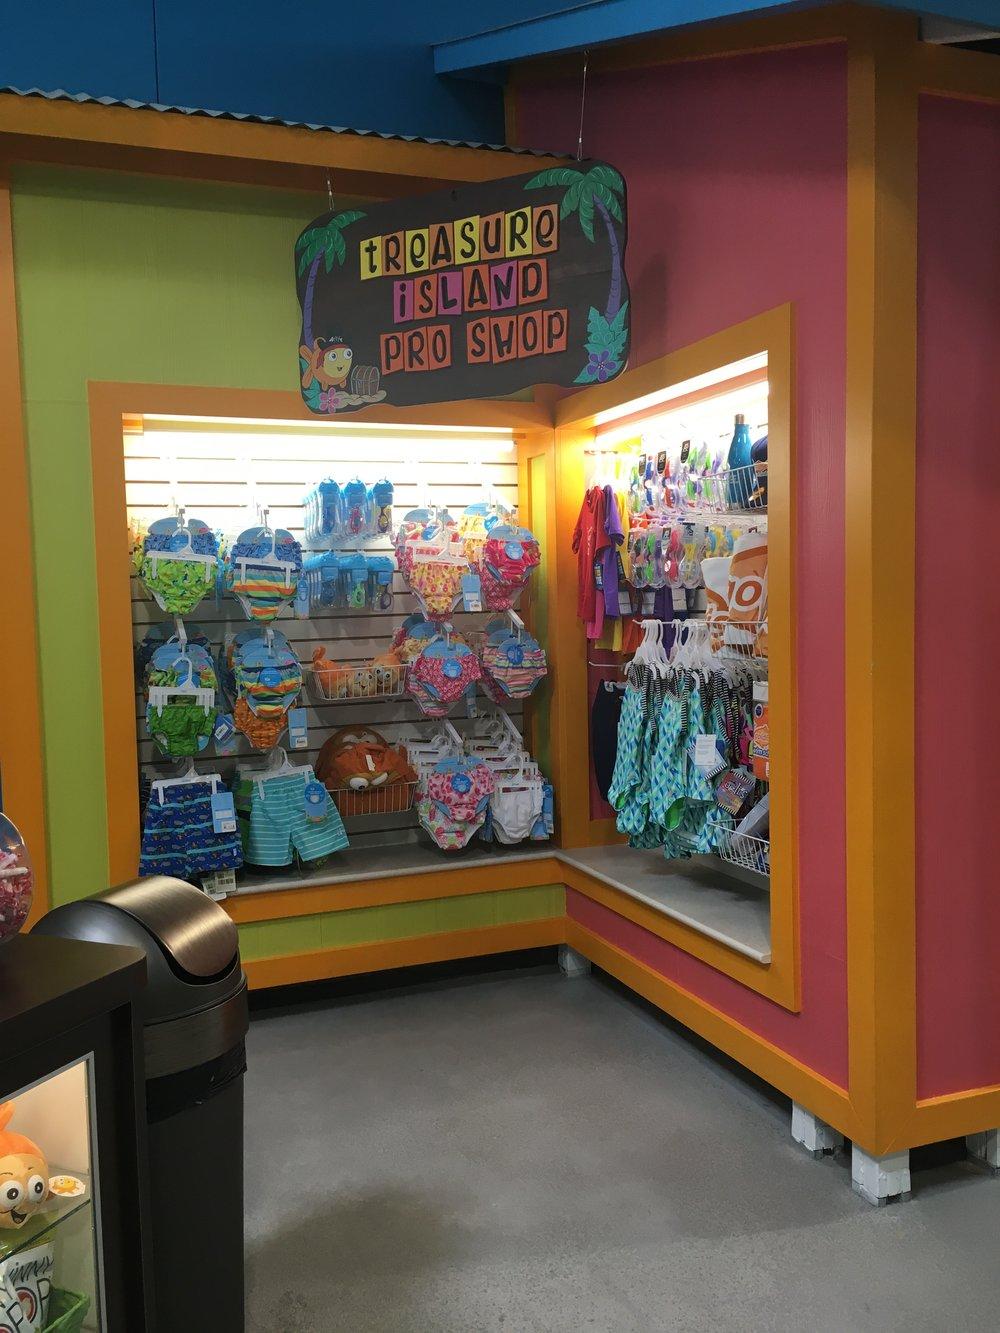 Treasure Island Pro Shop